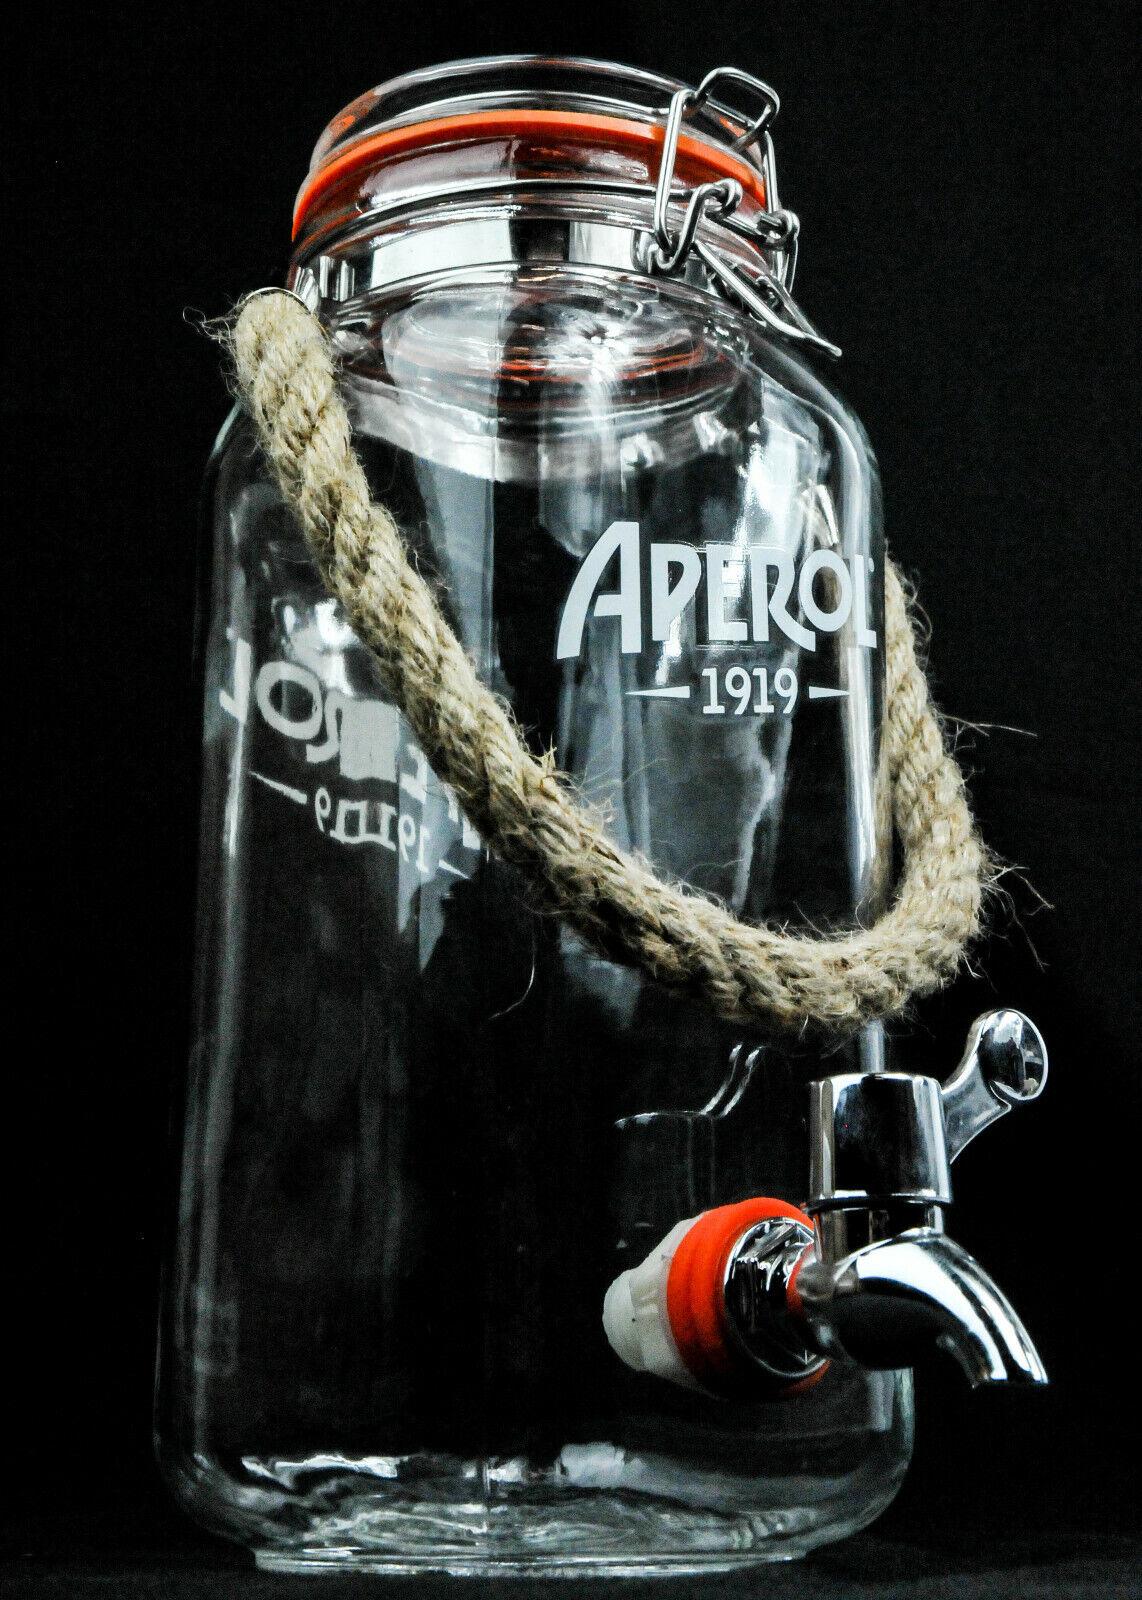 Aperol crie, 1,5 L Table-Zapfanlage, louche  1919 , bec verseur  table Barrel  O